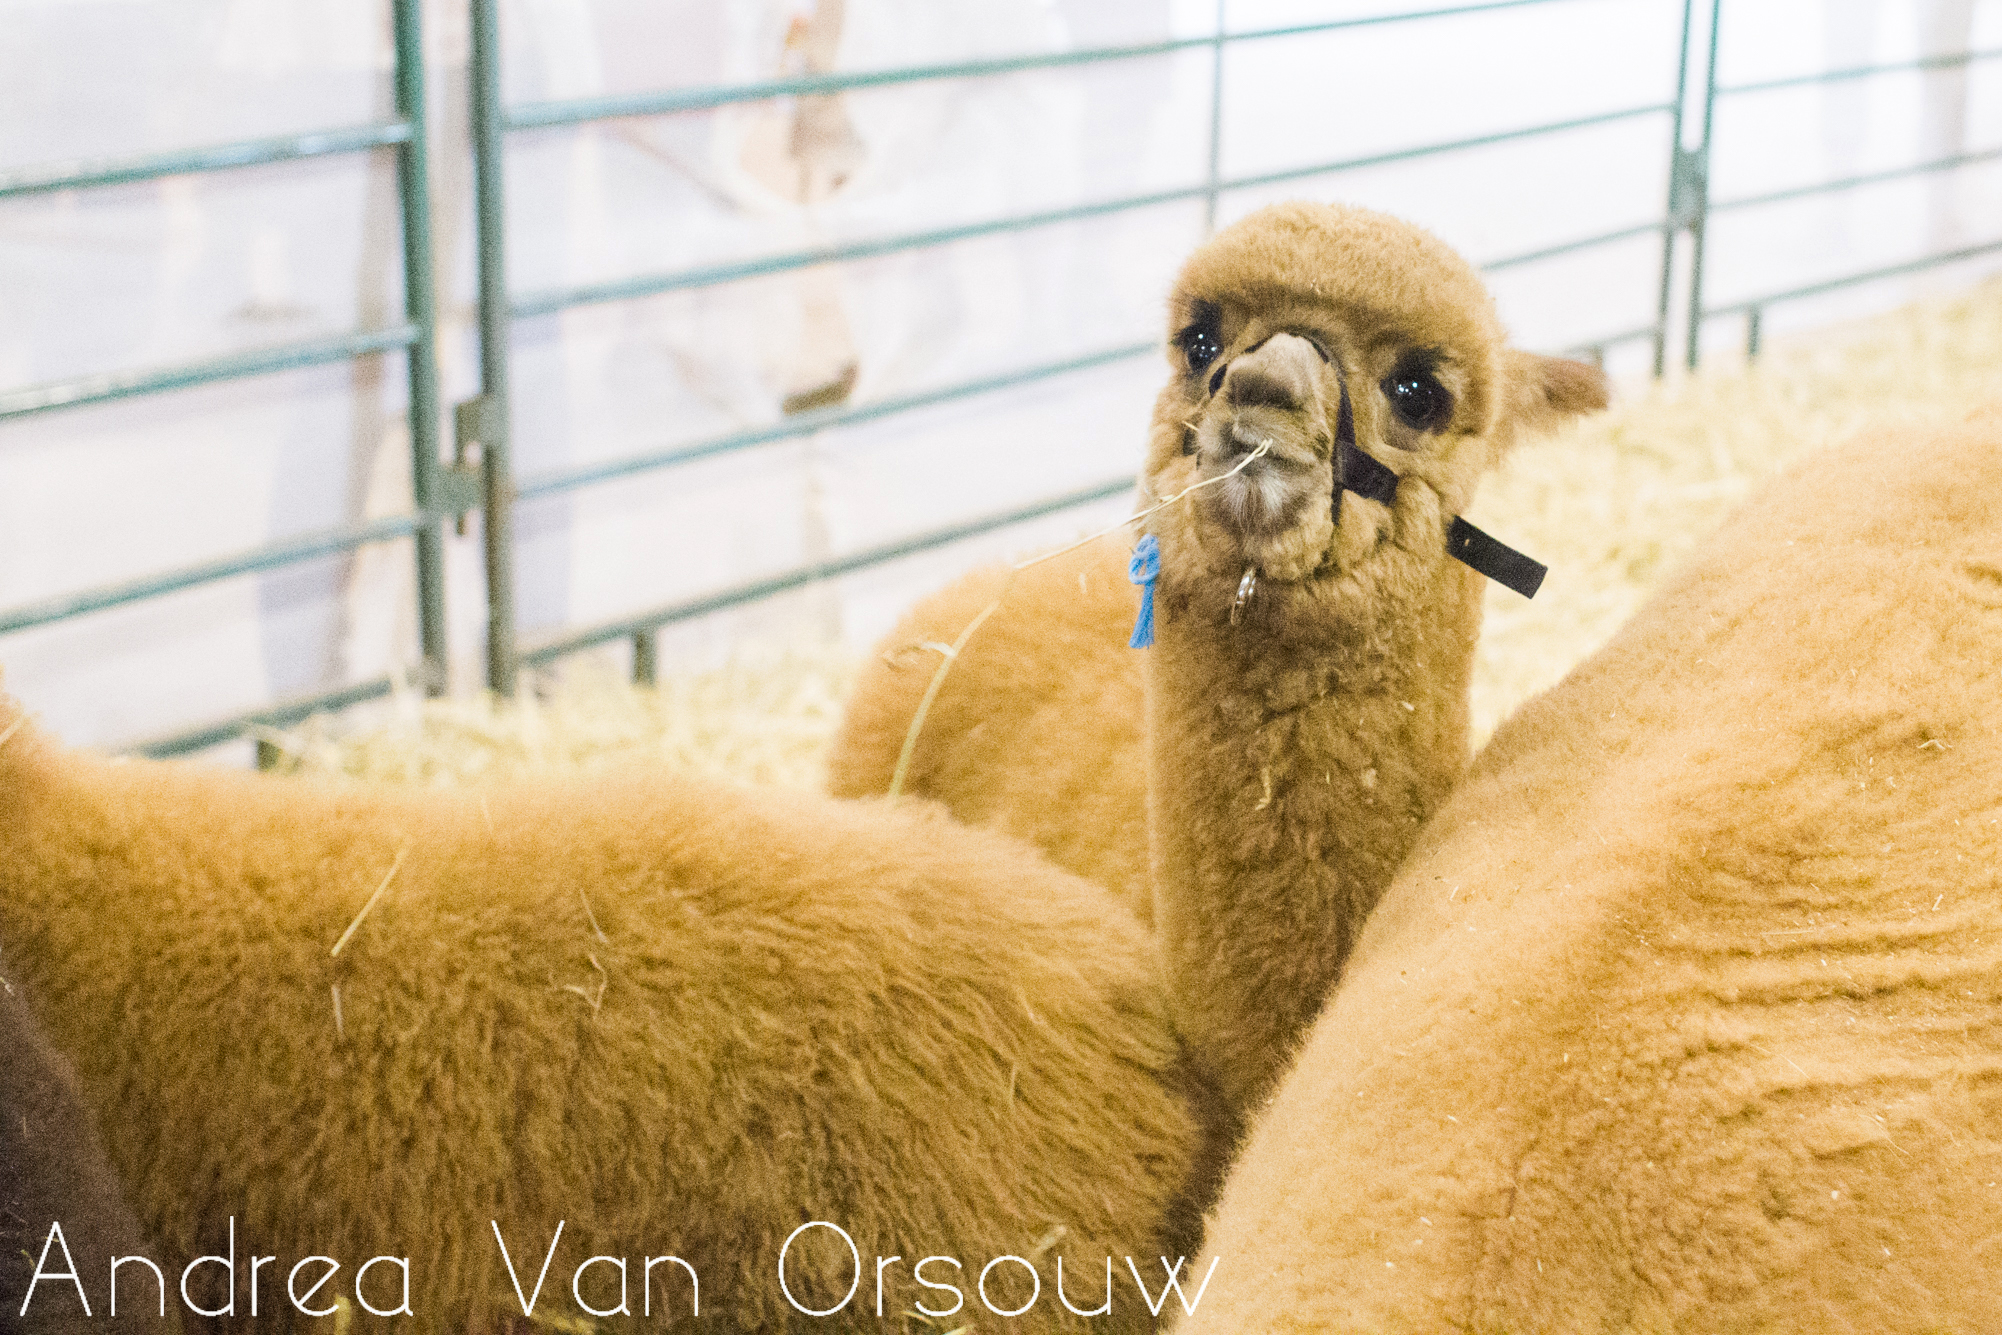 baby_llama_eating.jpg